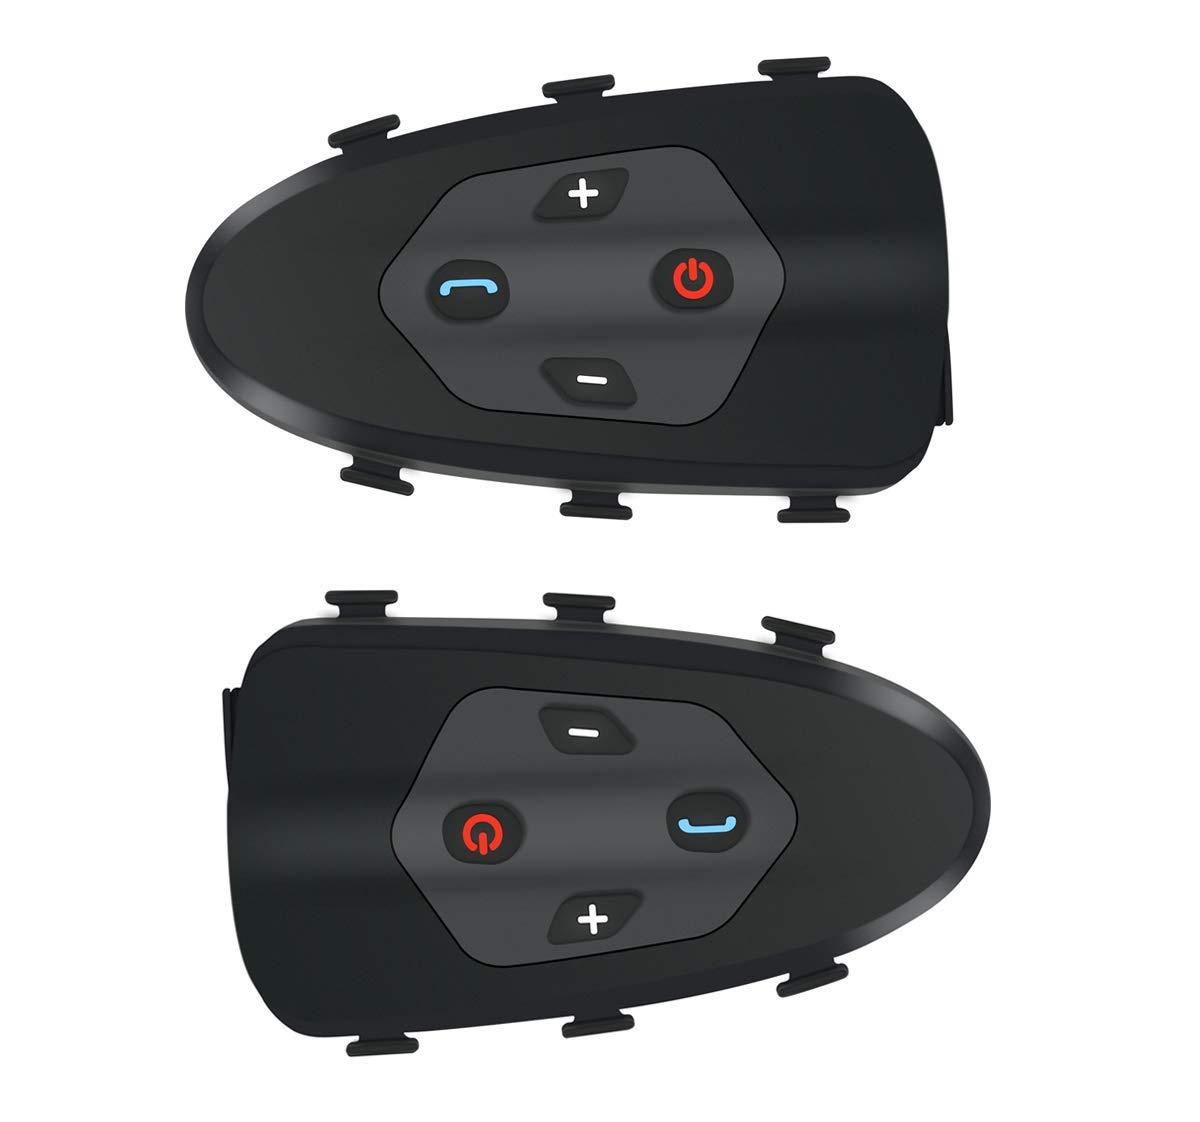 Bicycle Walkie-Talkie Bluetooth Headset Wireless Communication System IP65 Waterproof 1200M Intercom Distance Bicycle Helmet Dedicated (1 Pack) by SYNL